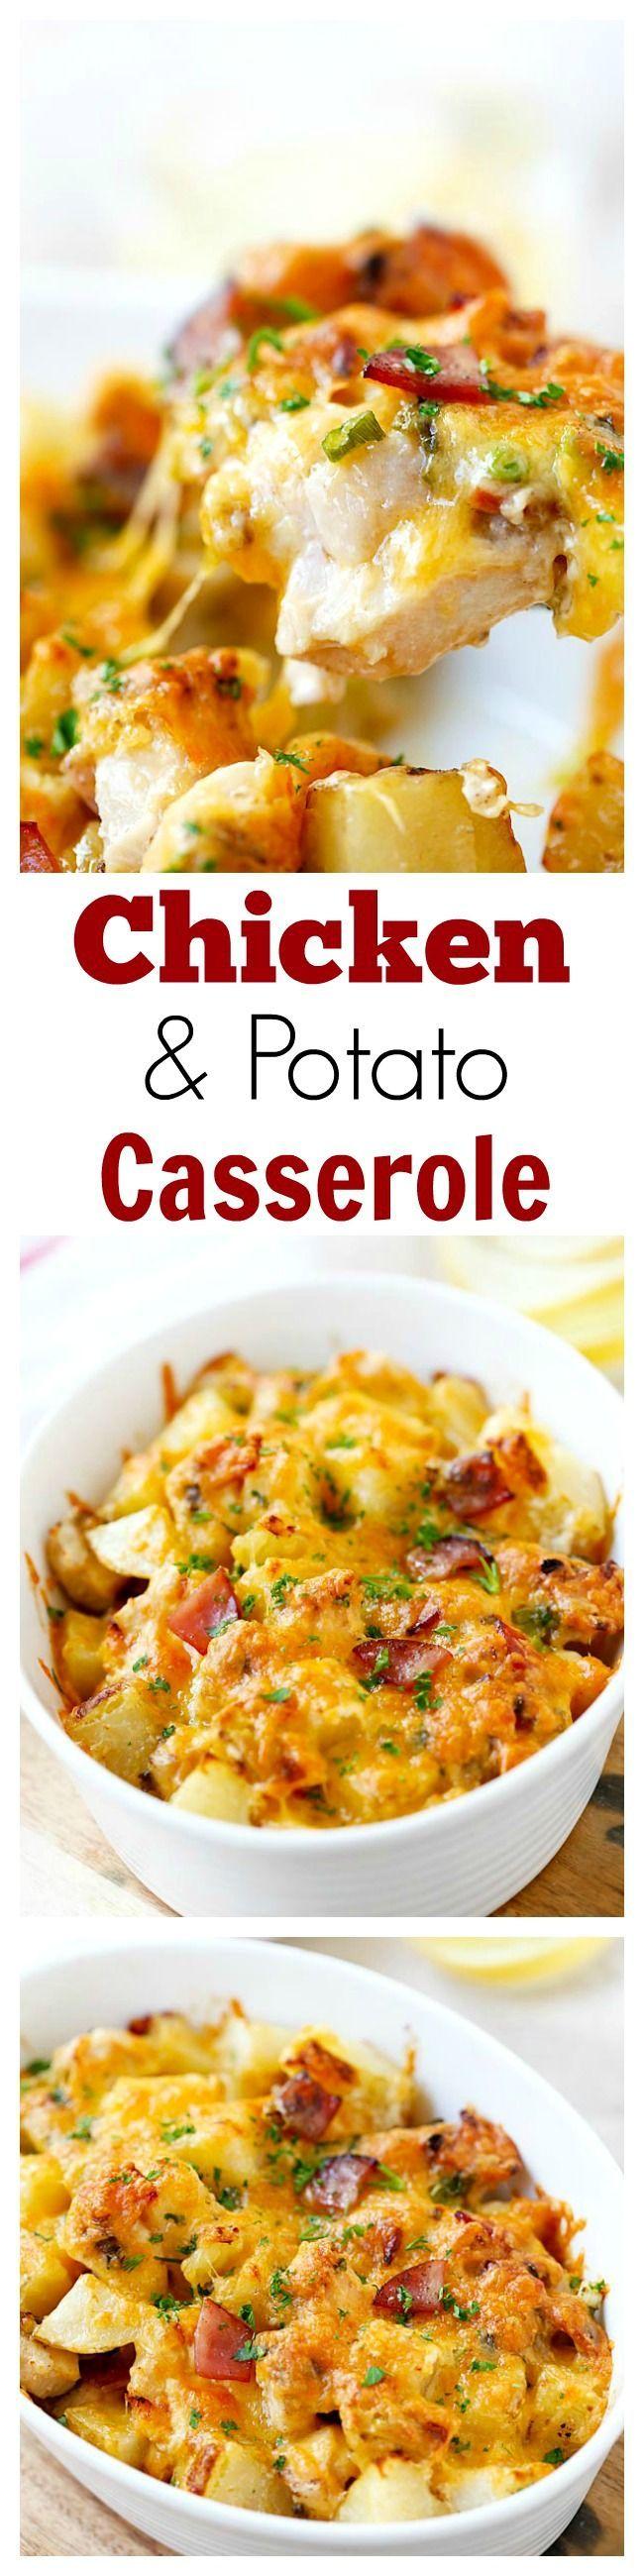 Baked Chicken and Potato Casserole - crazy delicious chicken potato casserole loaded with cheddar cheese, bacon and cream, easy recipe for the family | rasamalaysia.com